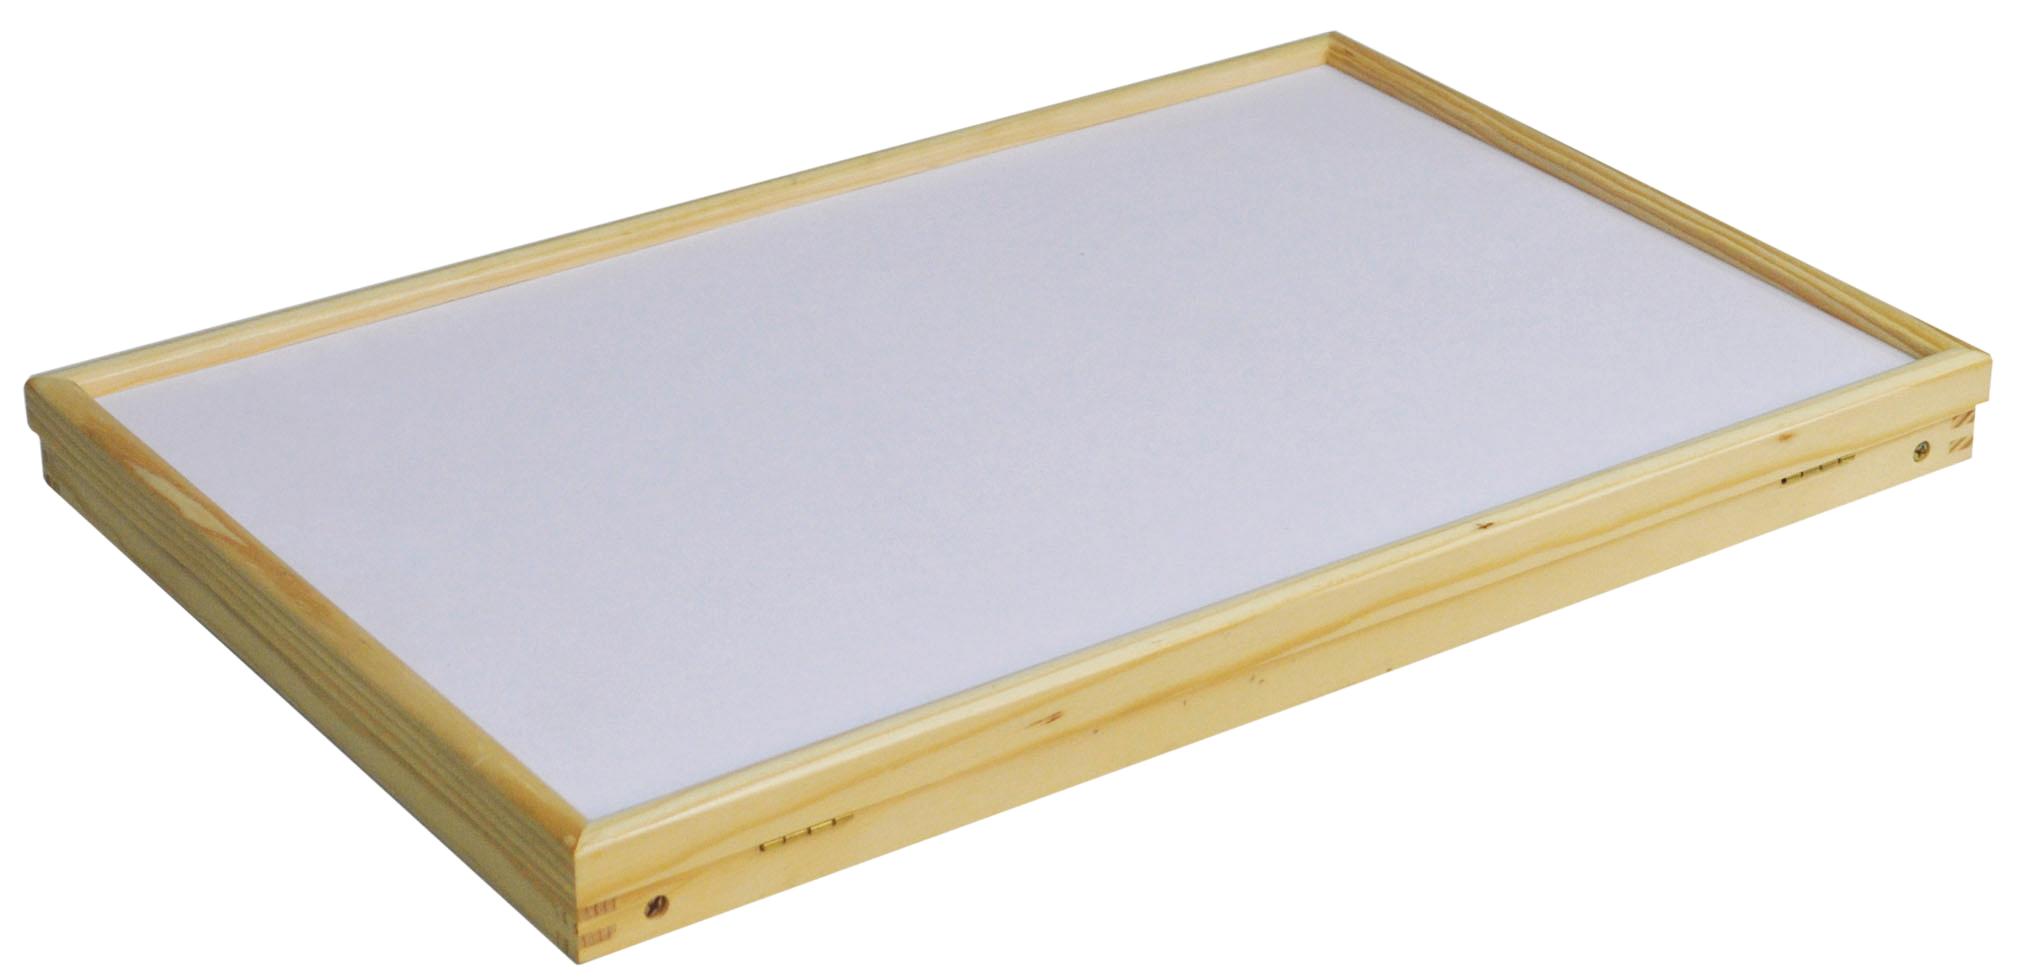 Folding Bed Tray 28 Images Portable Folding Lap Desk